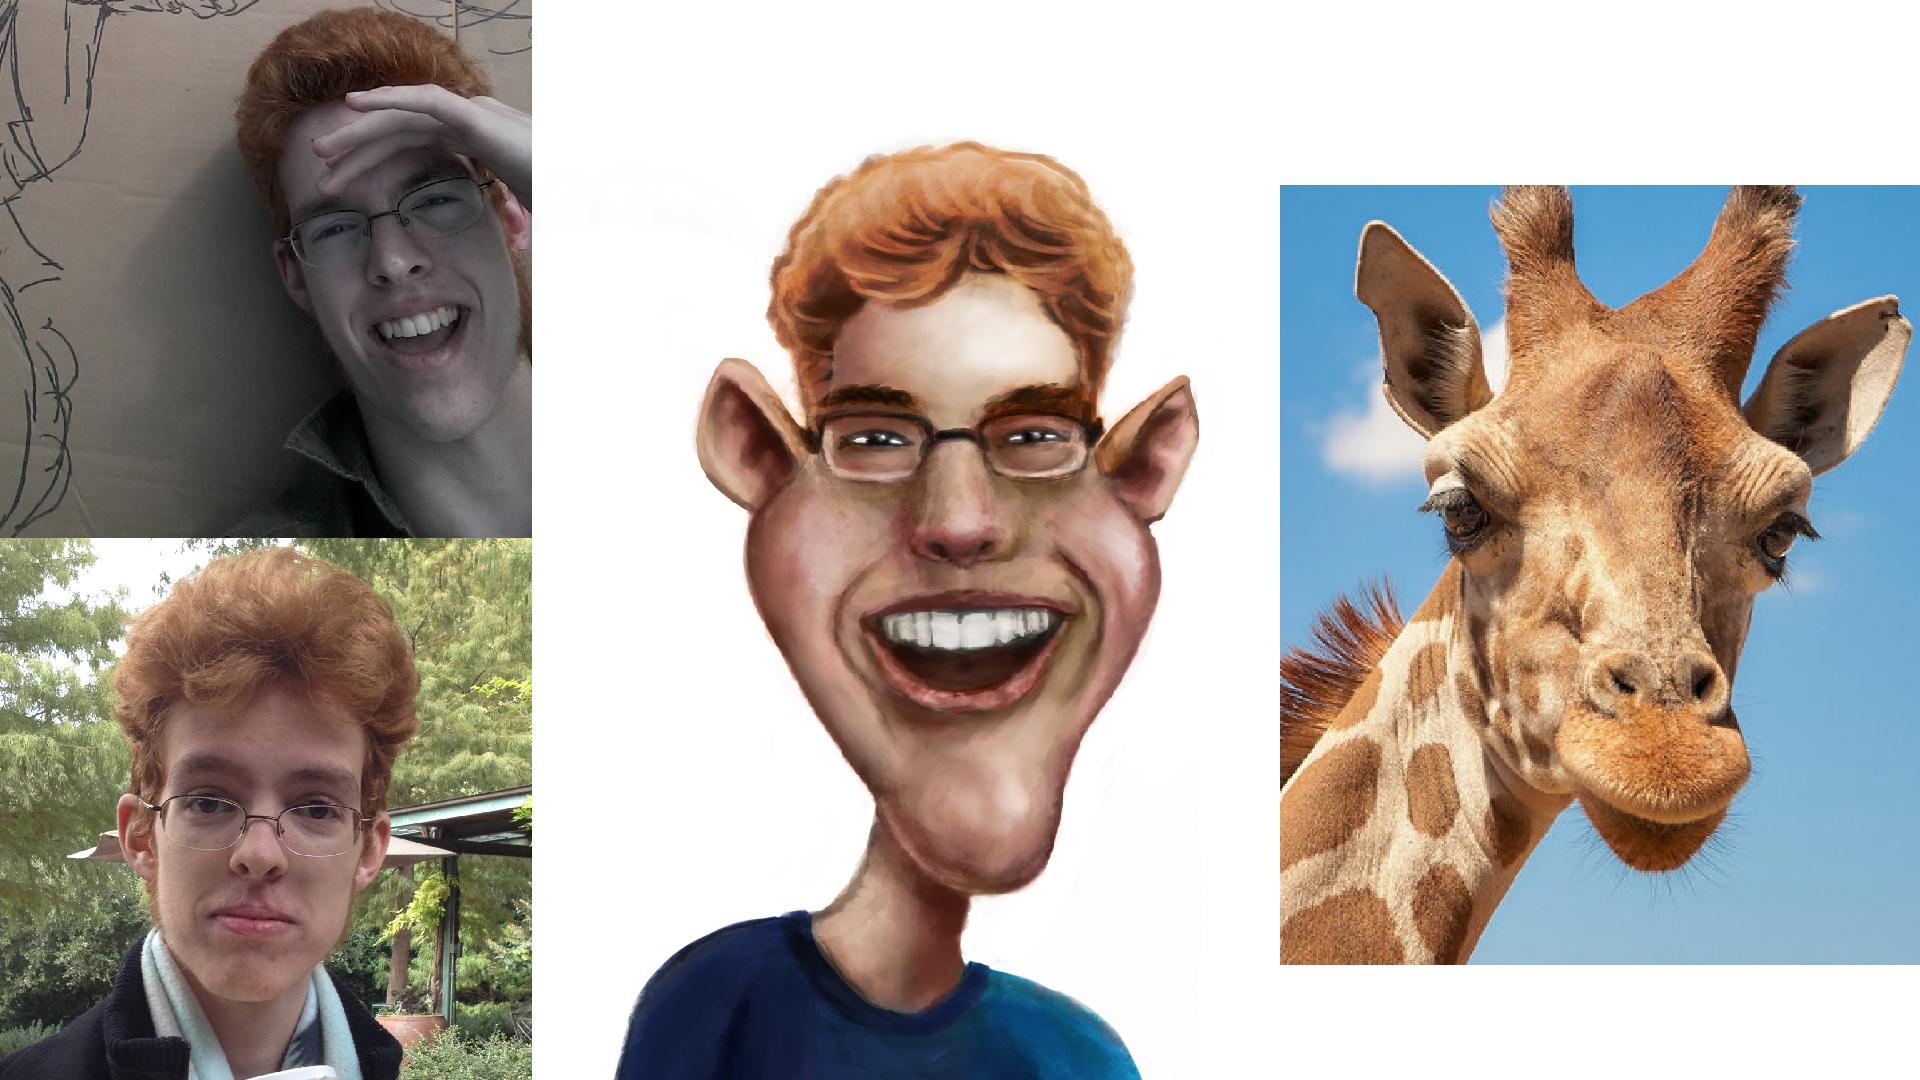 Caricature - Crossing Ezra with a Giraffe